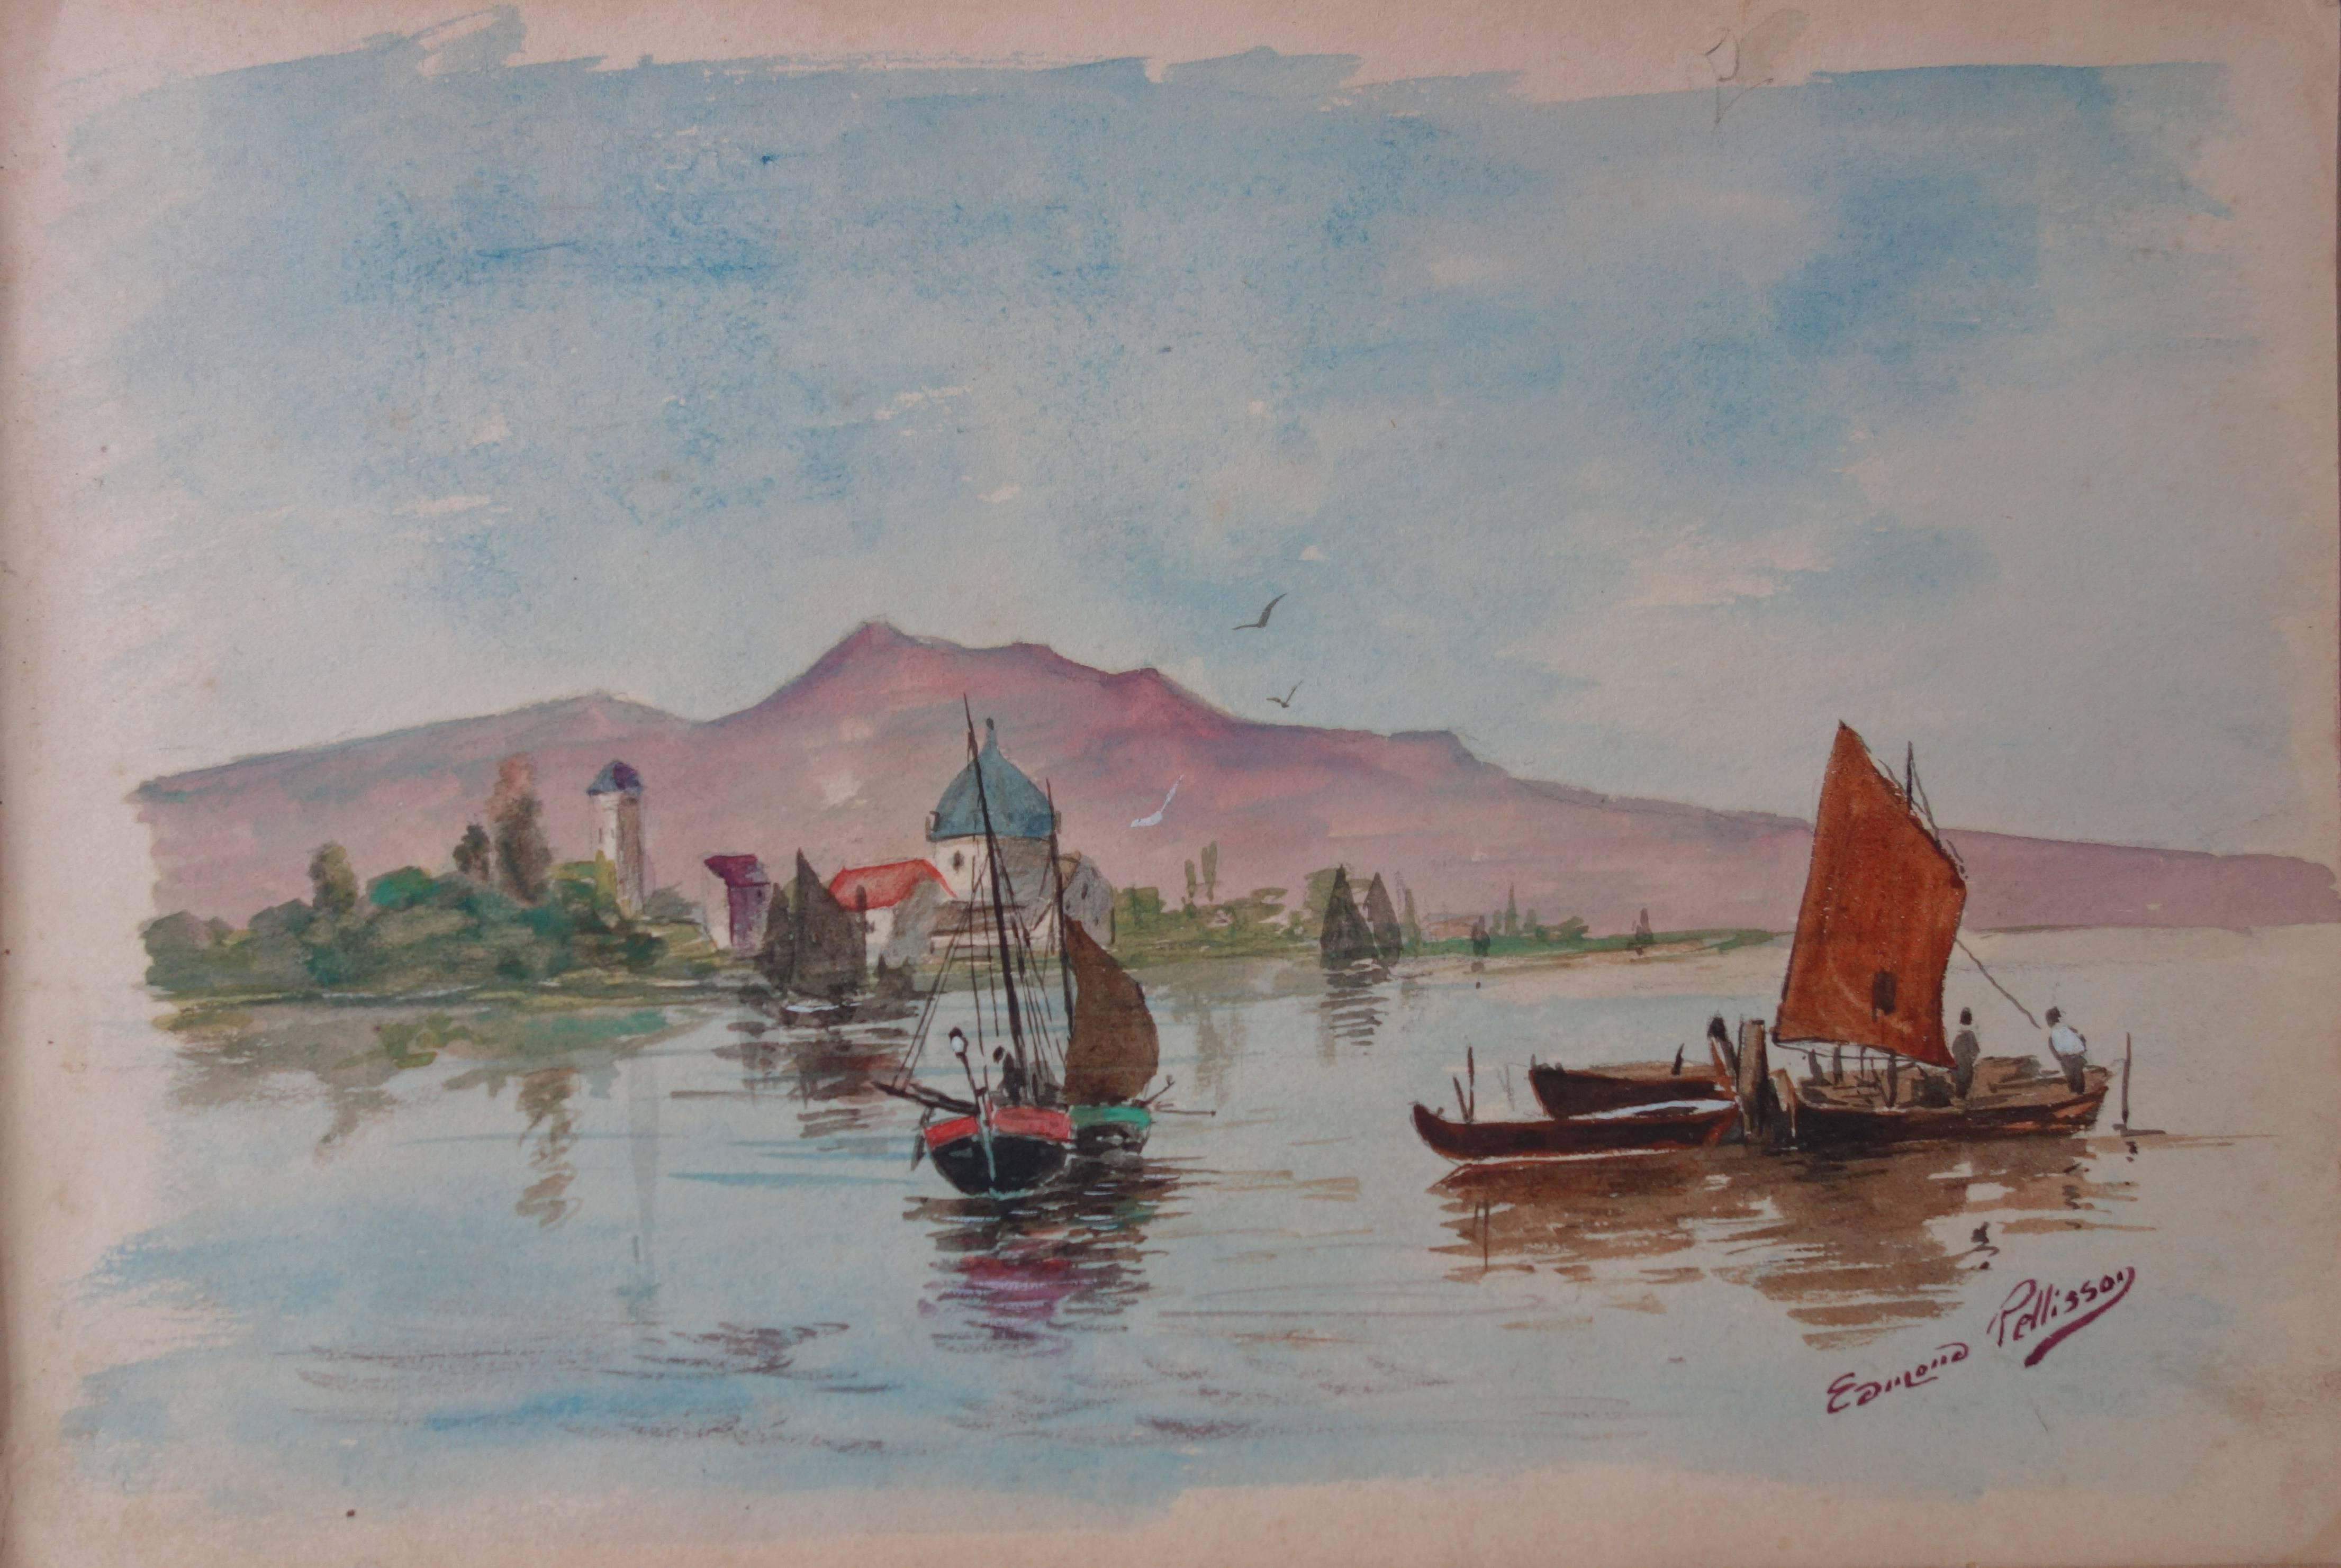 Boats in Morocco - Original handsigned watercolor - c. 1899